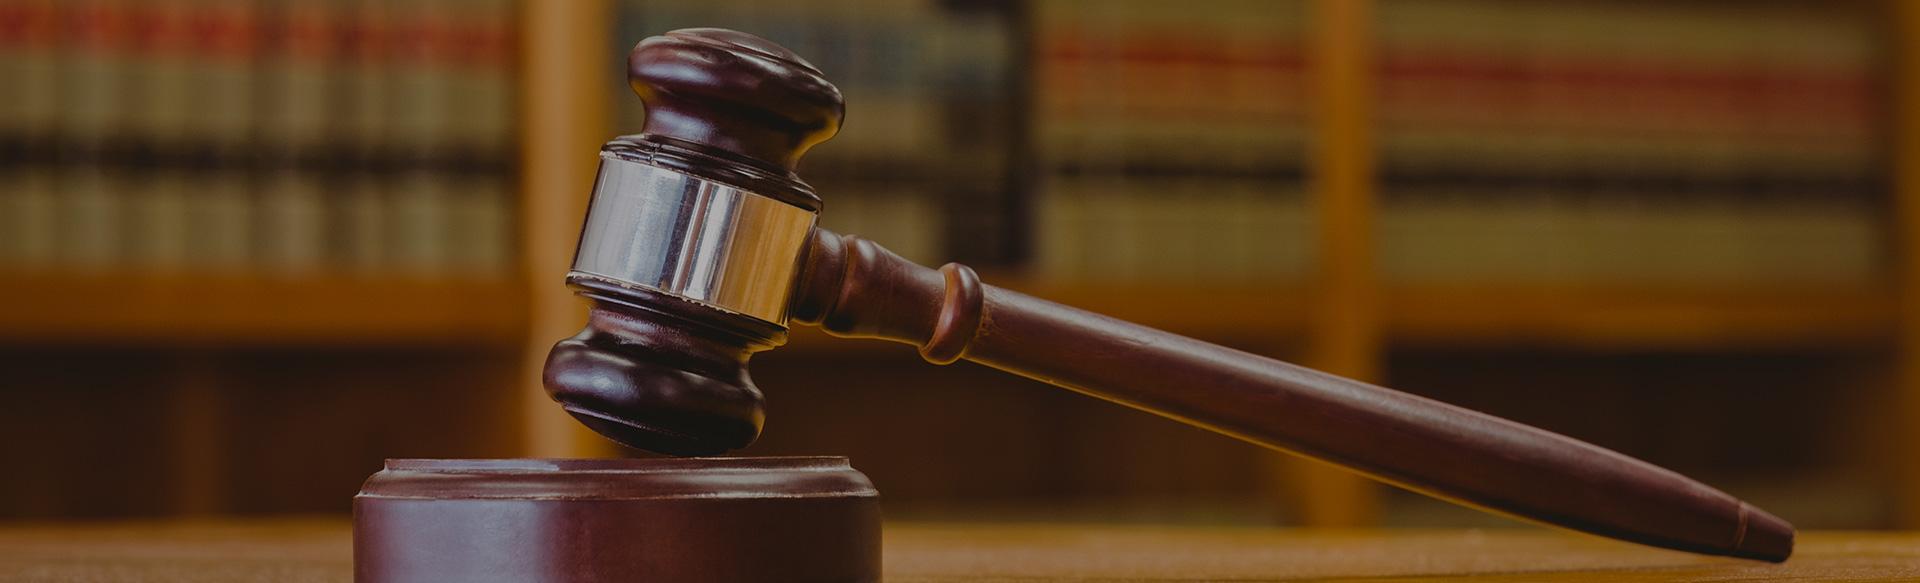 Kim Thayer & Associates Court Reporters Slide Image